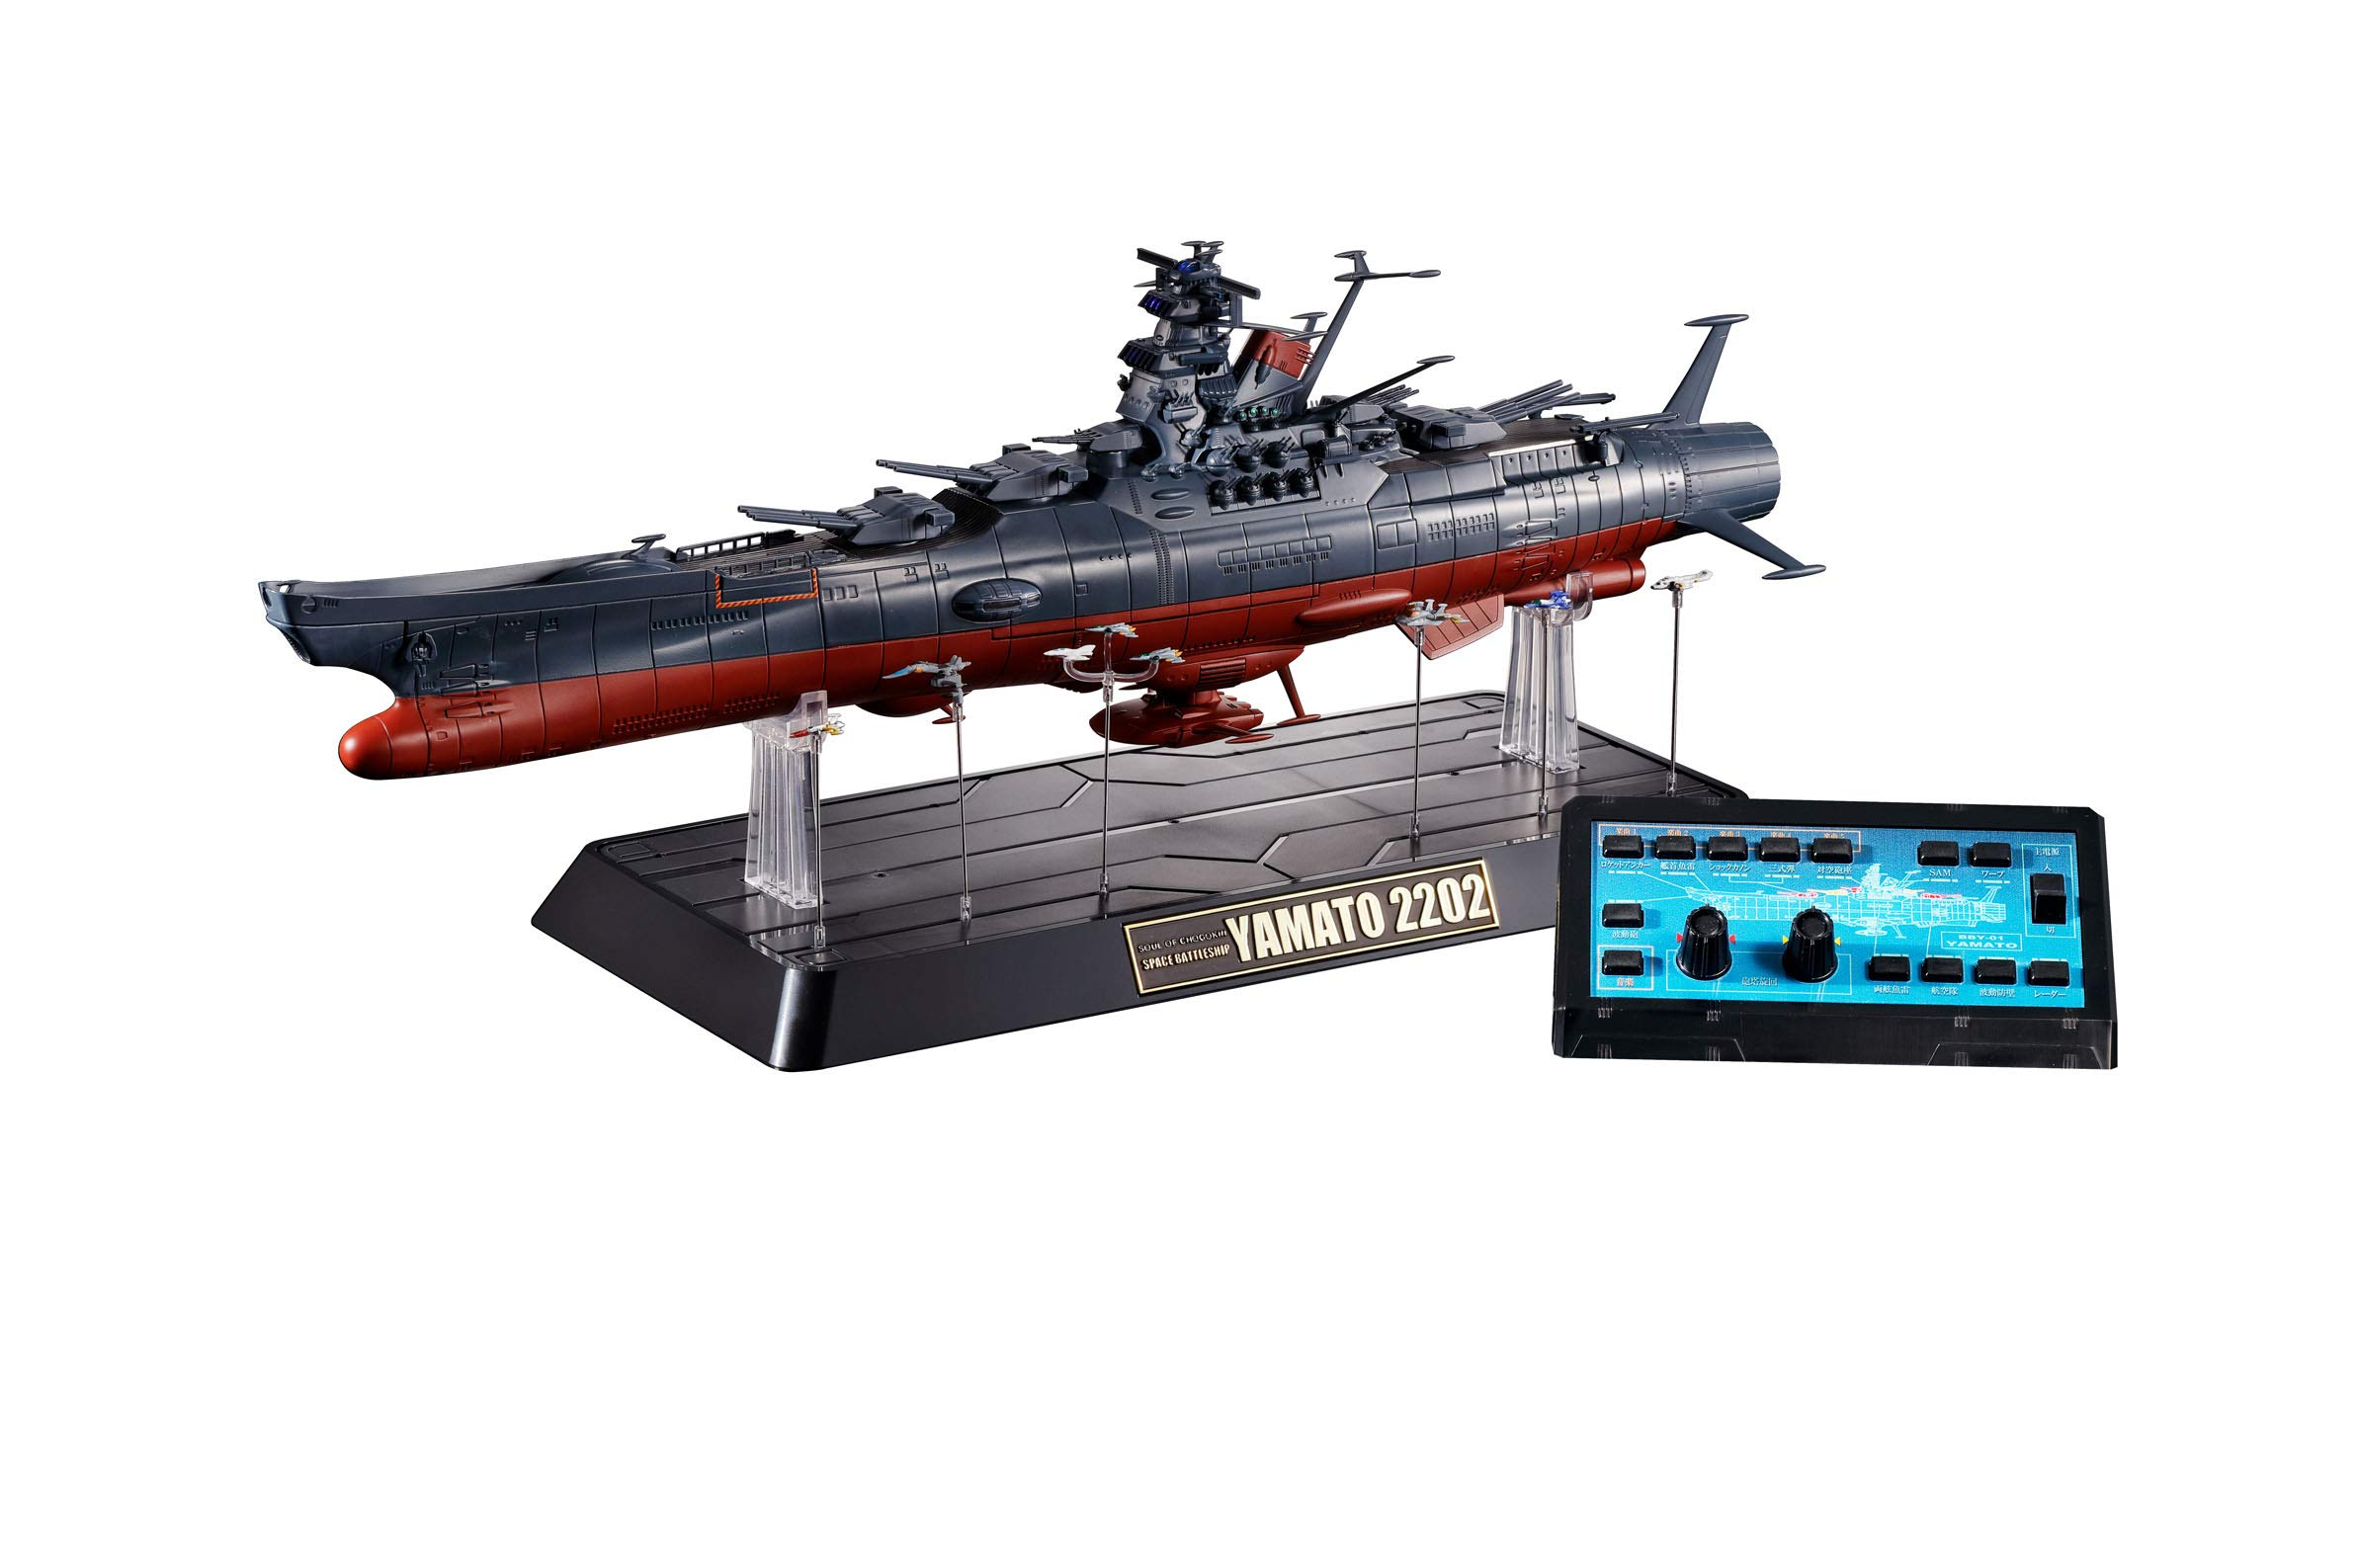 Bandai Tamashii Nations Soul of Chogokin GX-86 Space Battleship Yamato 2202 ''Space Battle Ship Yamato Statue